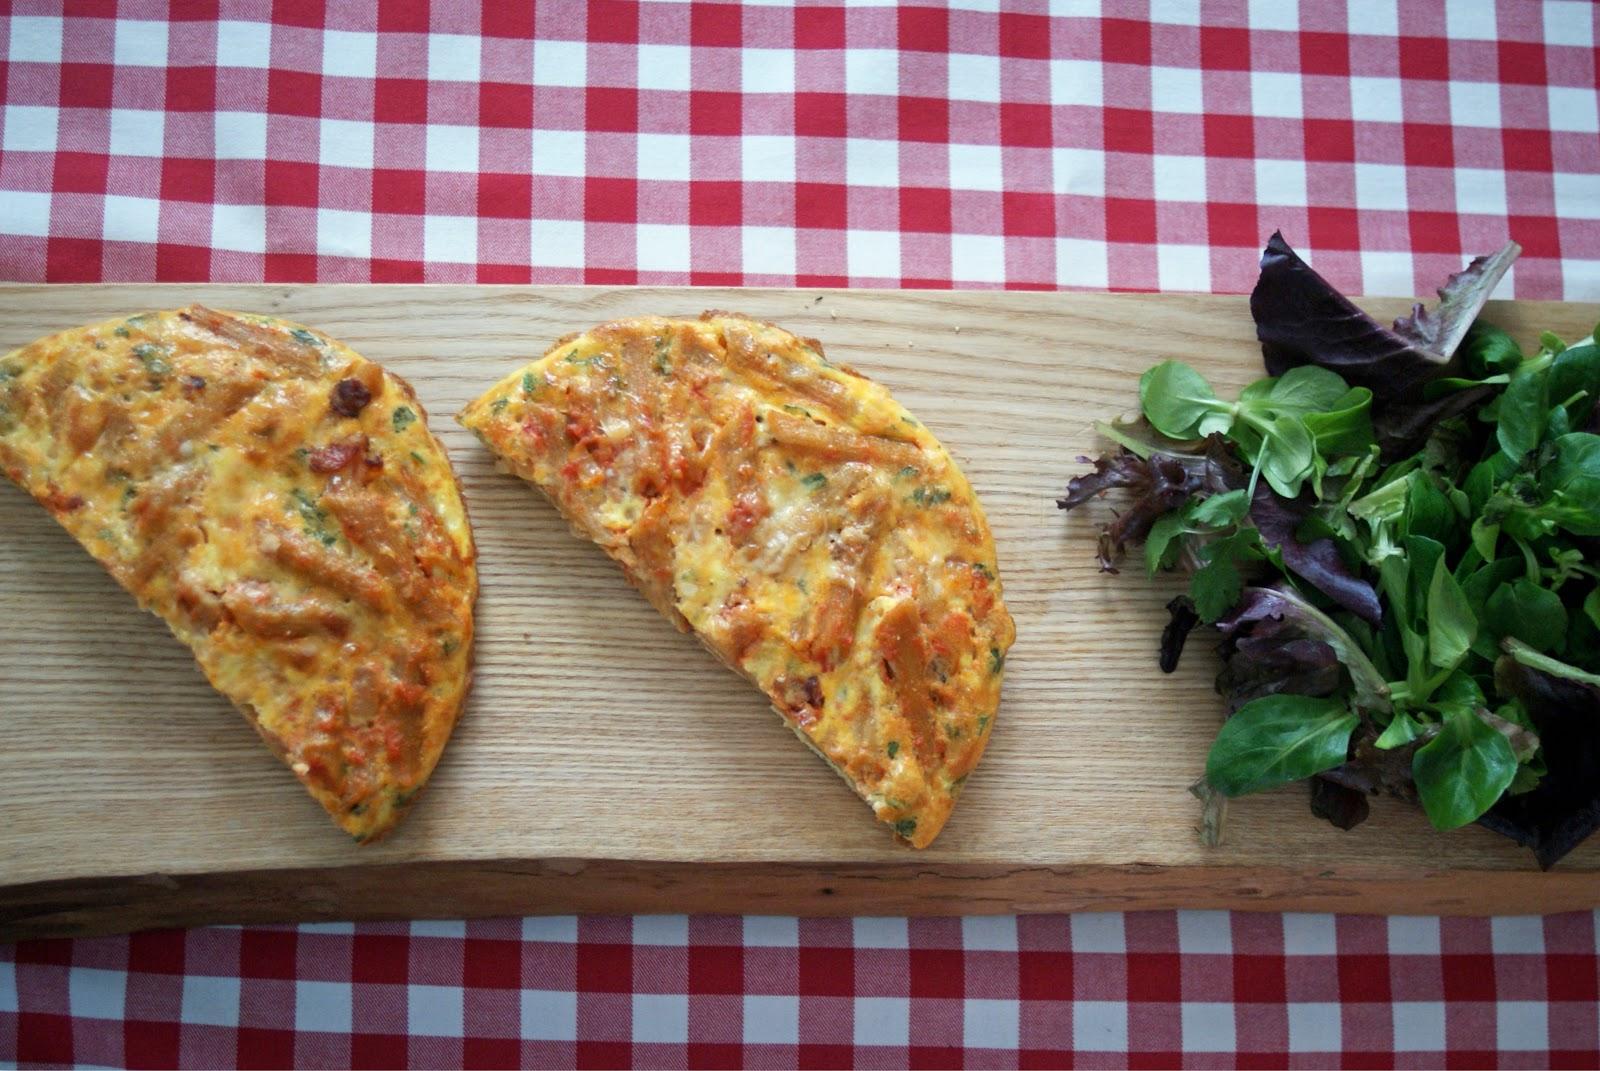 Piccante Dolce: Sunday Brunch: Pasta Frittata